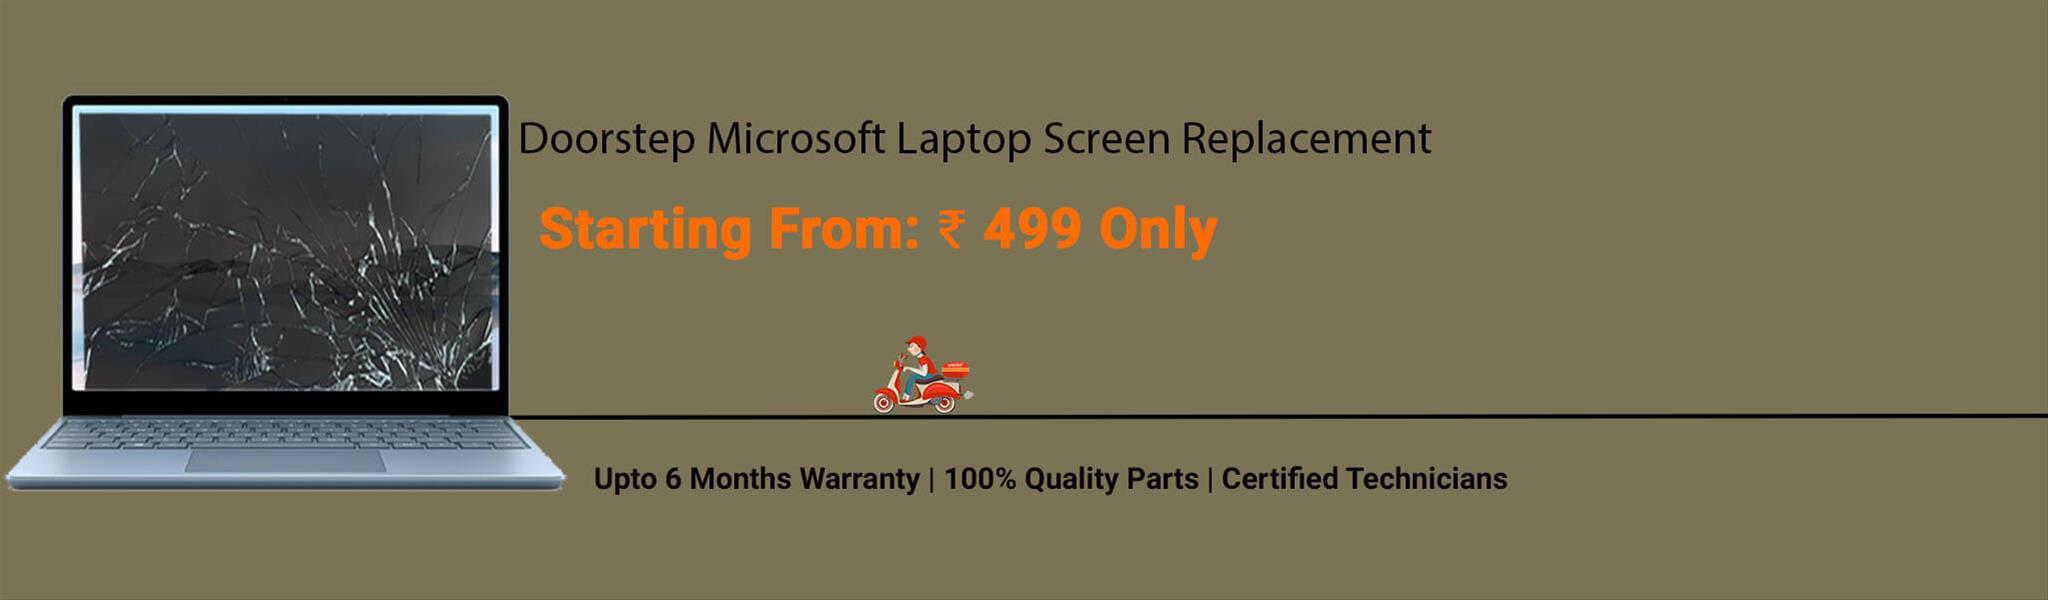 microsoft-laptop-screen-replacement.jpg